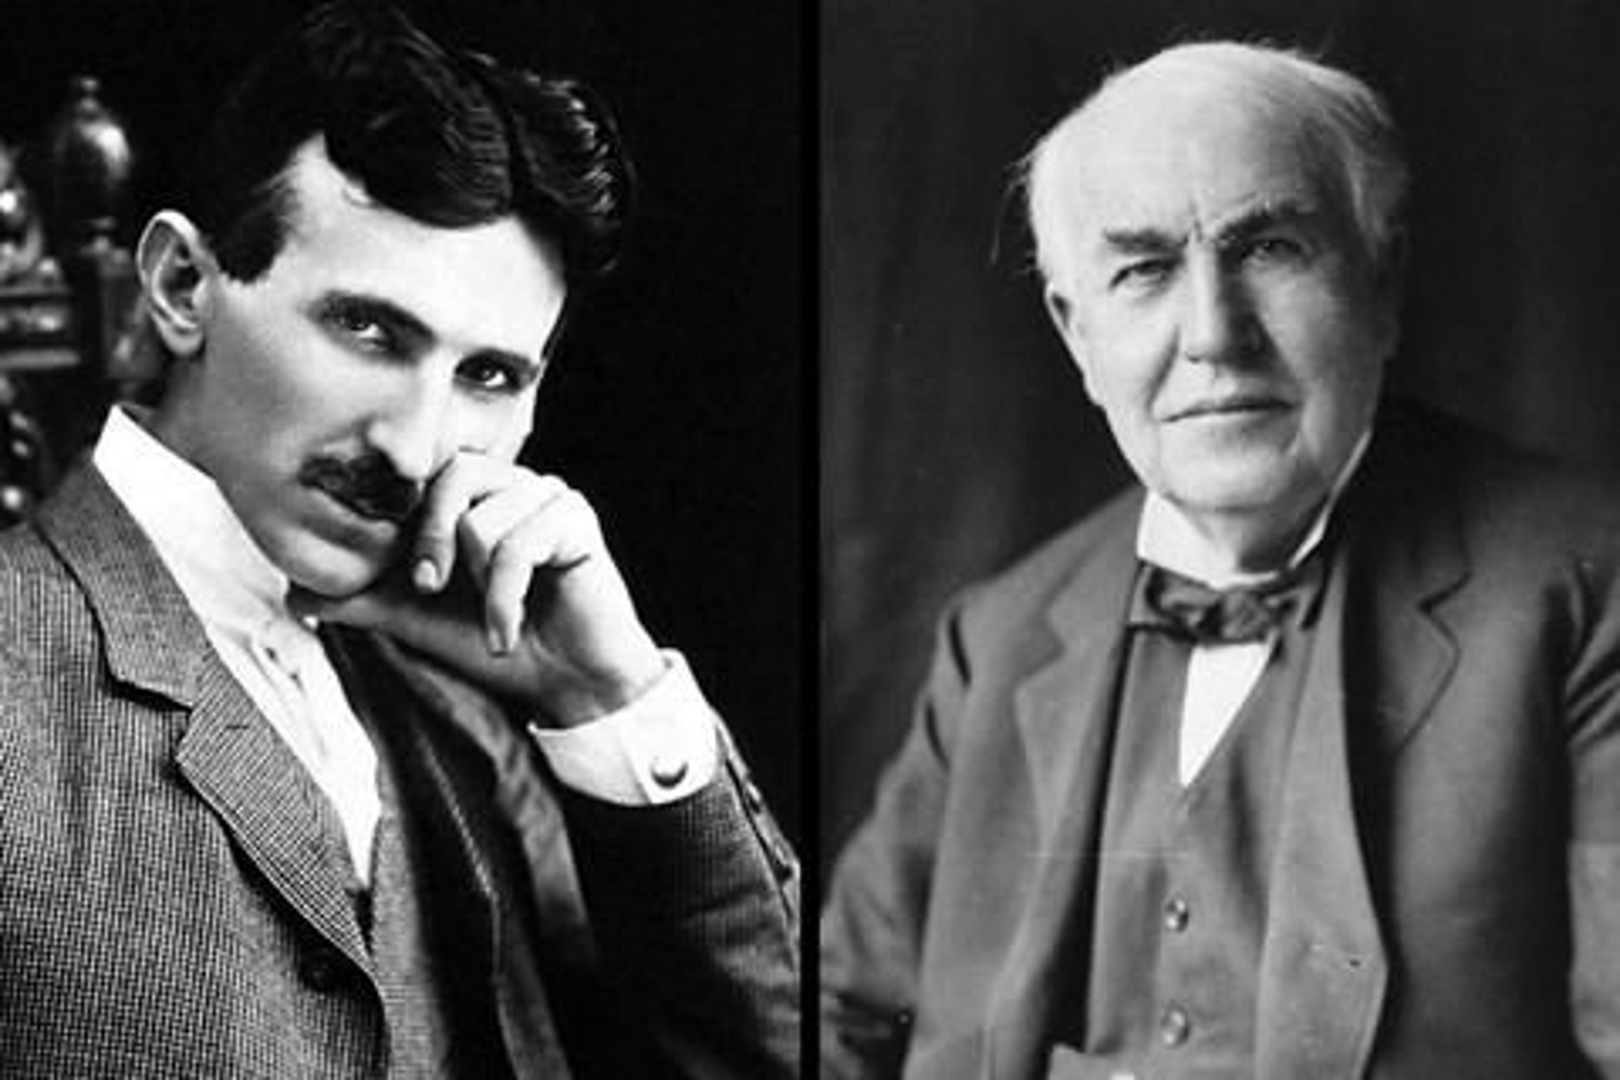 Imagem de Gênio vs Gênio #1: a rivalidade elétrica entre Thomas Edison e Nikola Tesla no tecmundo